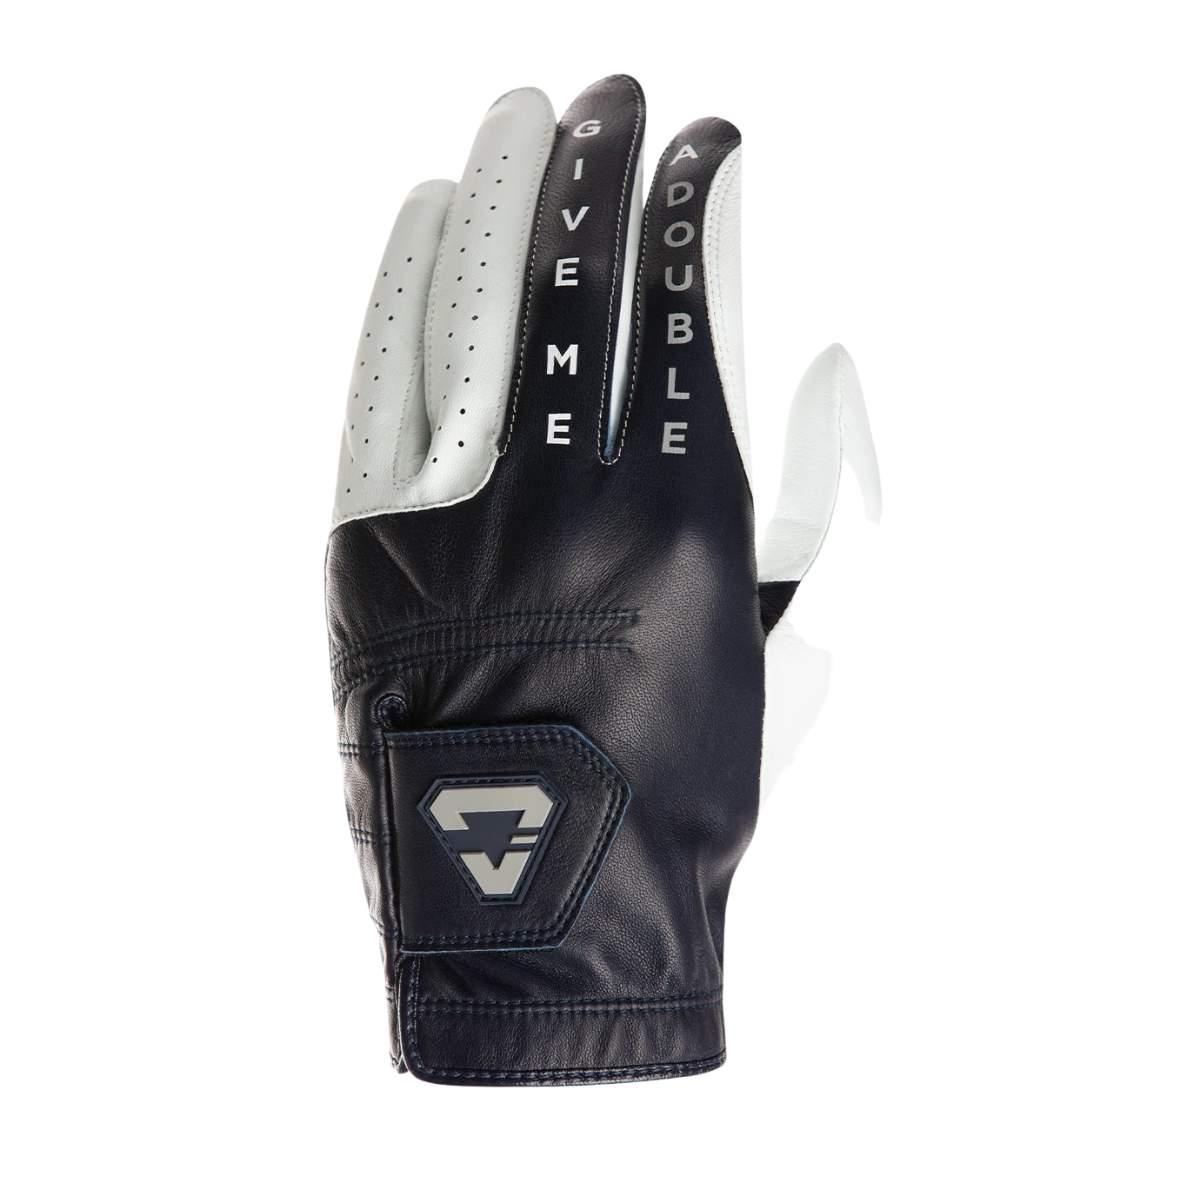 TravisMathew Double Me Golf Glove - Left Hand Cadet